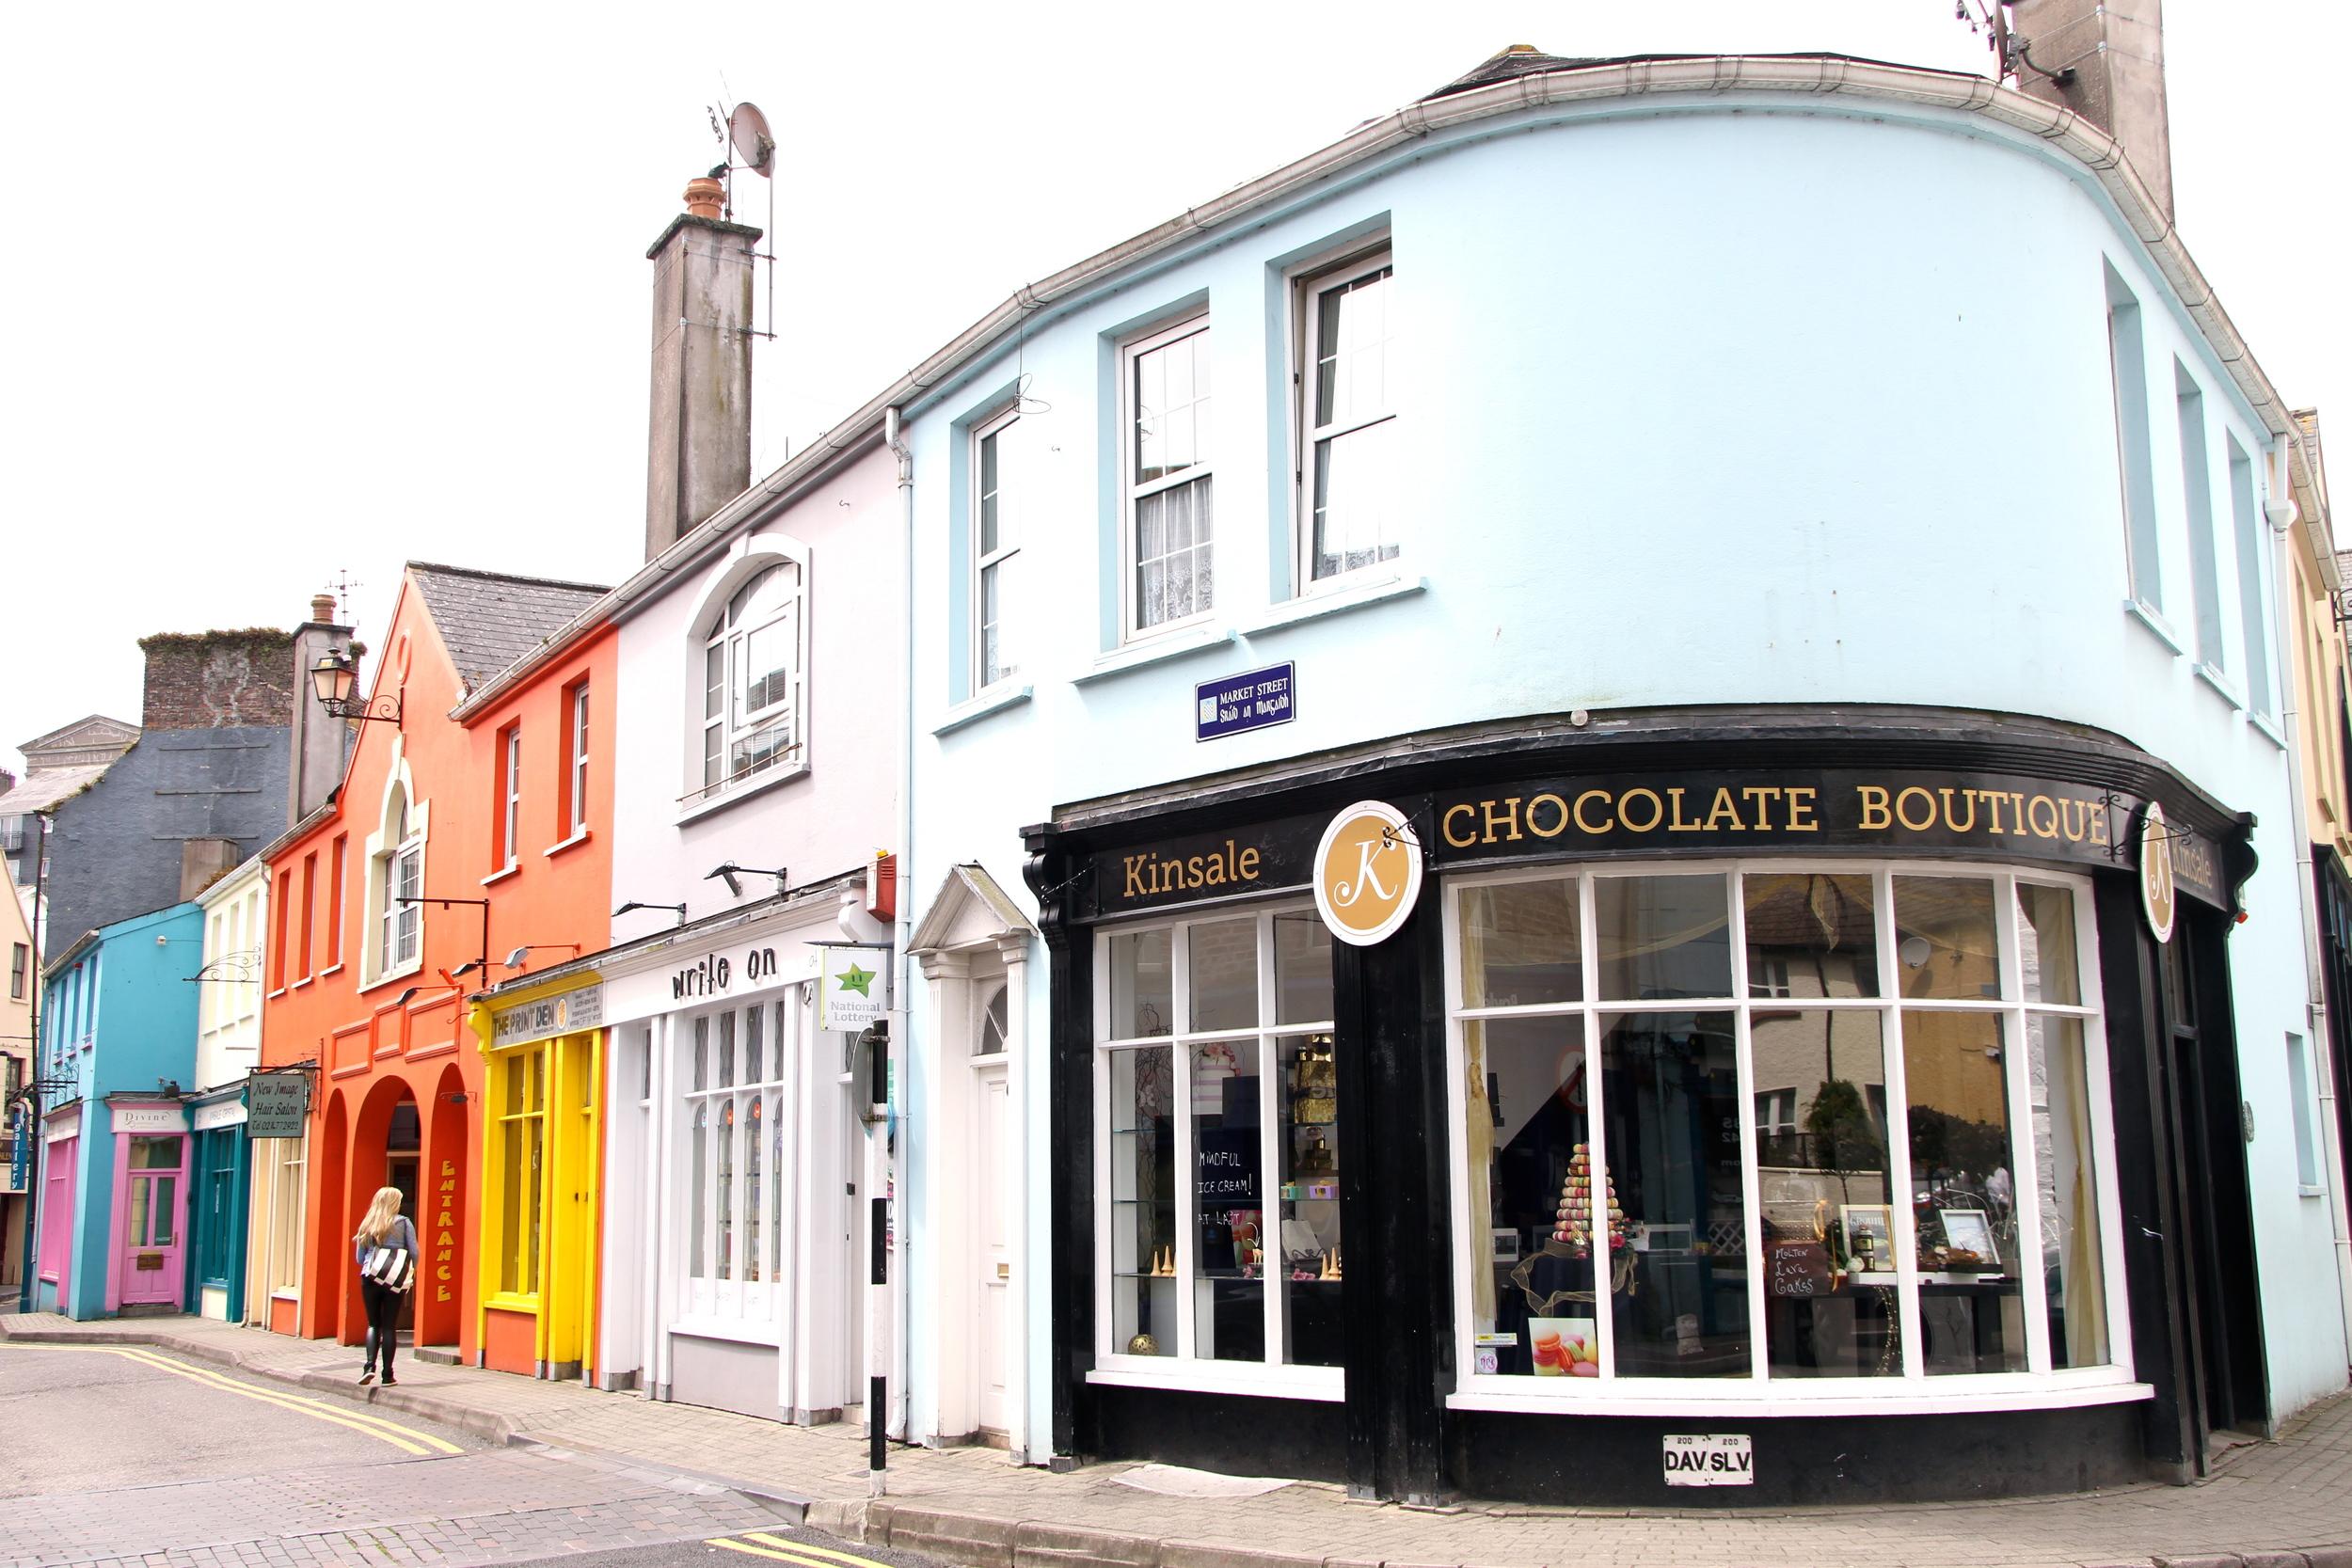 Kinsale, Co. Cork, Ireland.